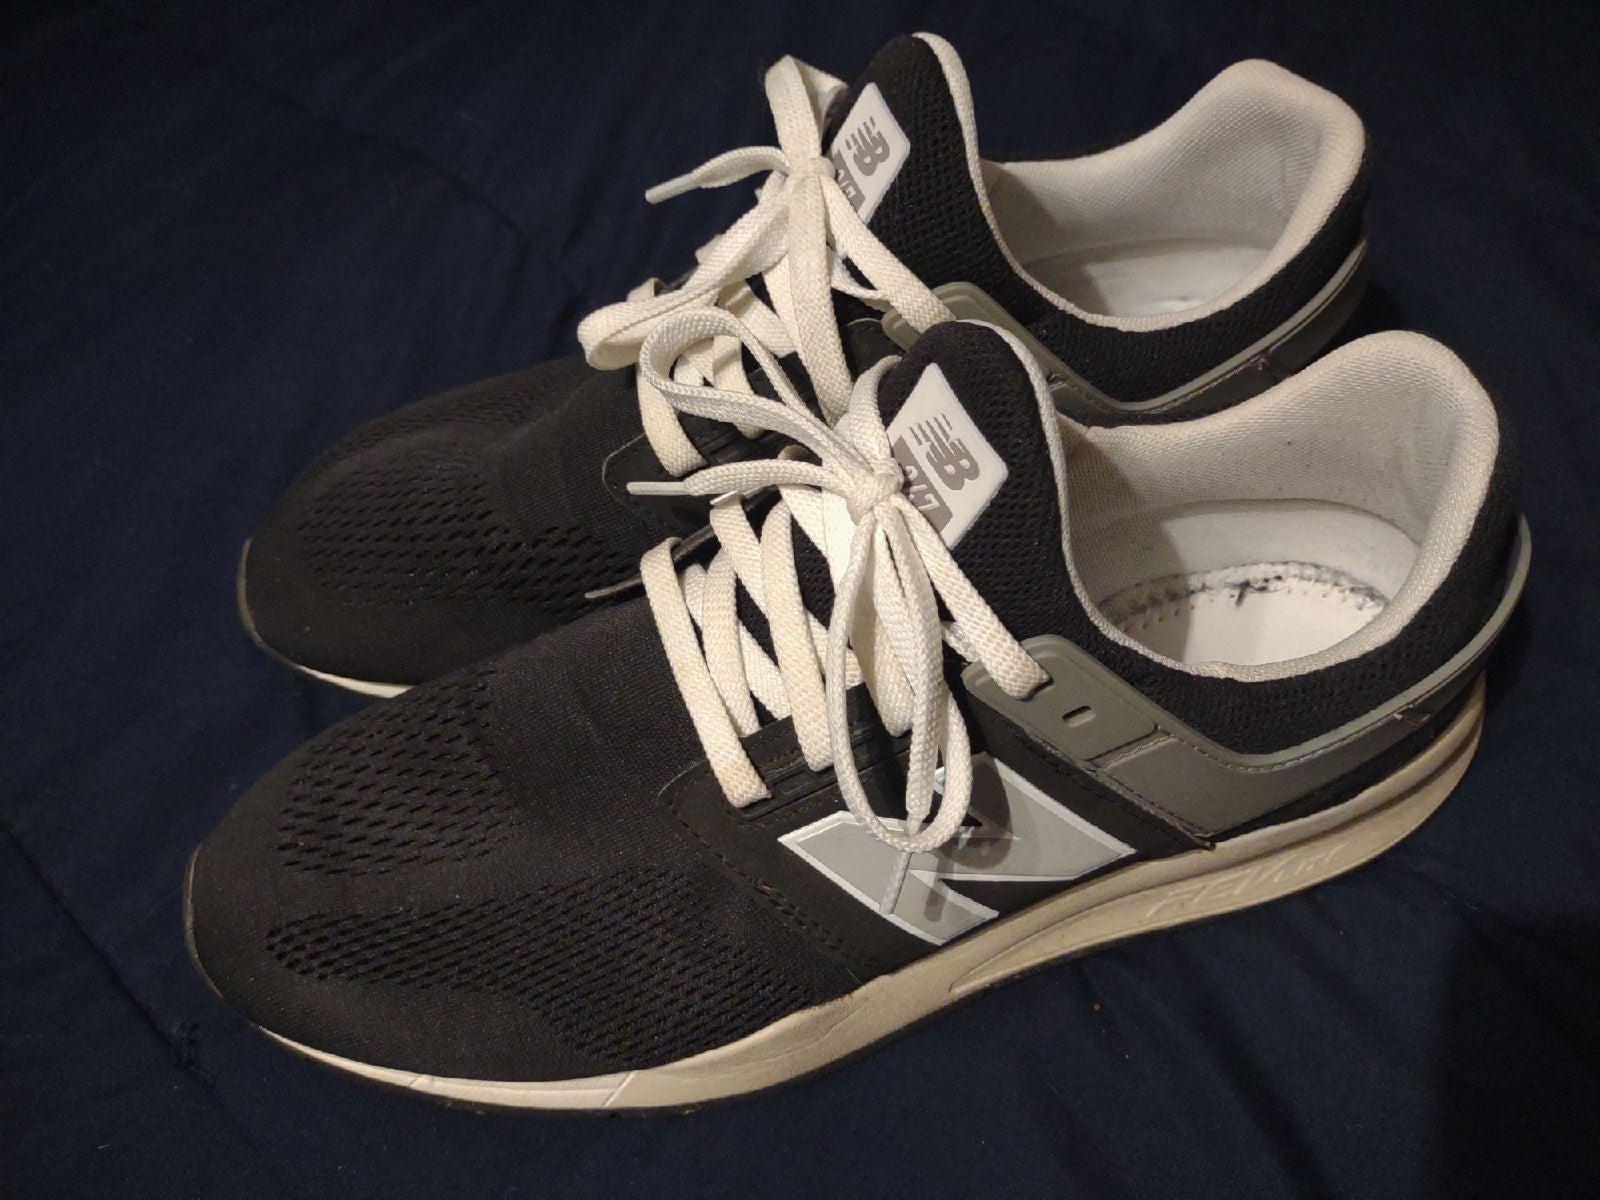 New Balance 247 Sneakers 11 2E